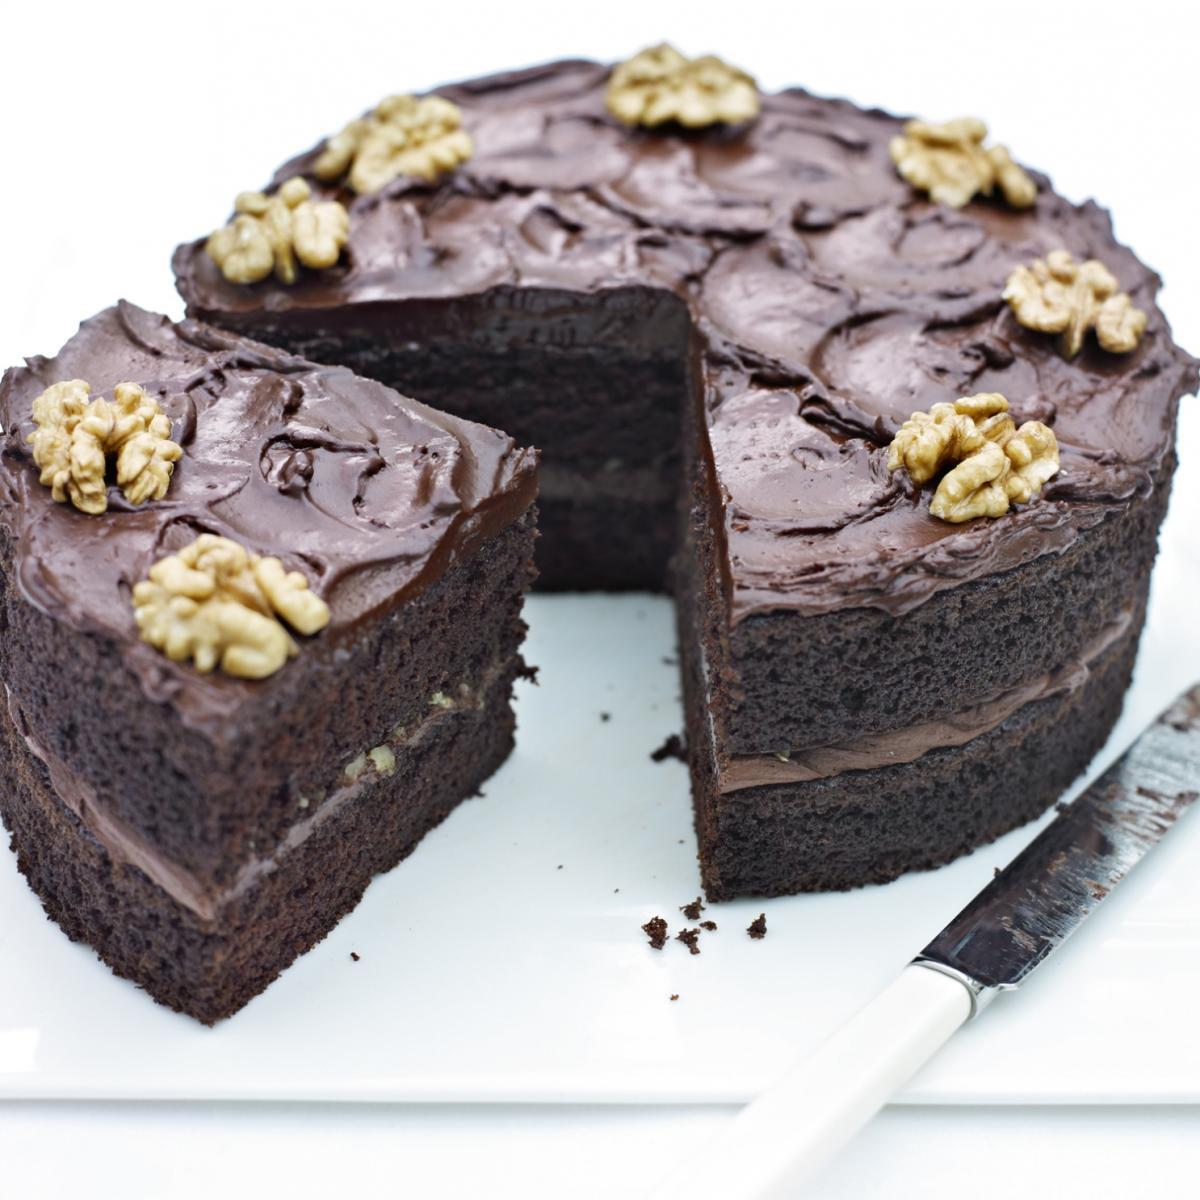 Chocolate Simnel Cake Recipe Chocolate Simnel Cake Recipe new foto